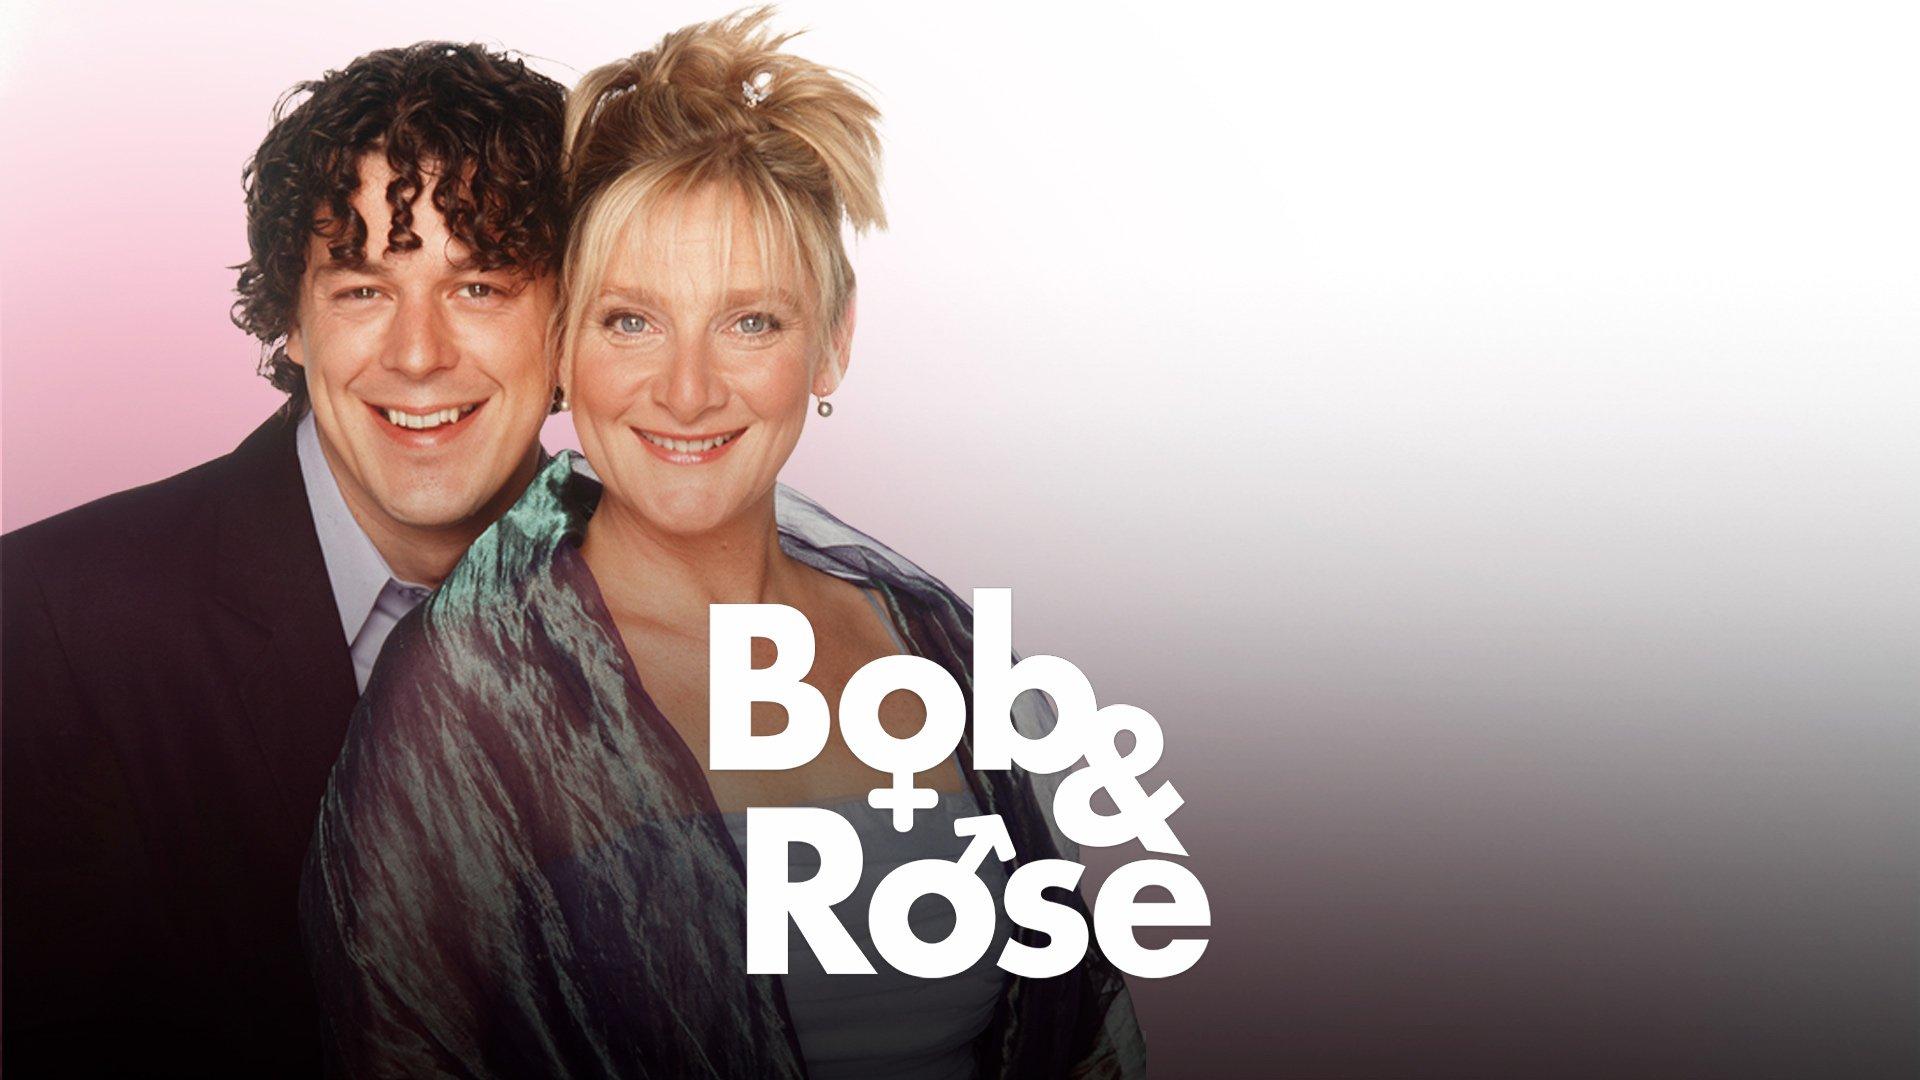 Bob and Rose on BritBox UK